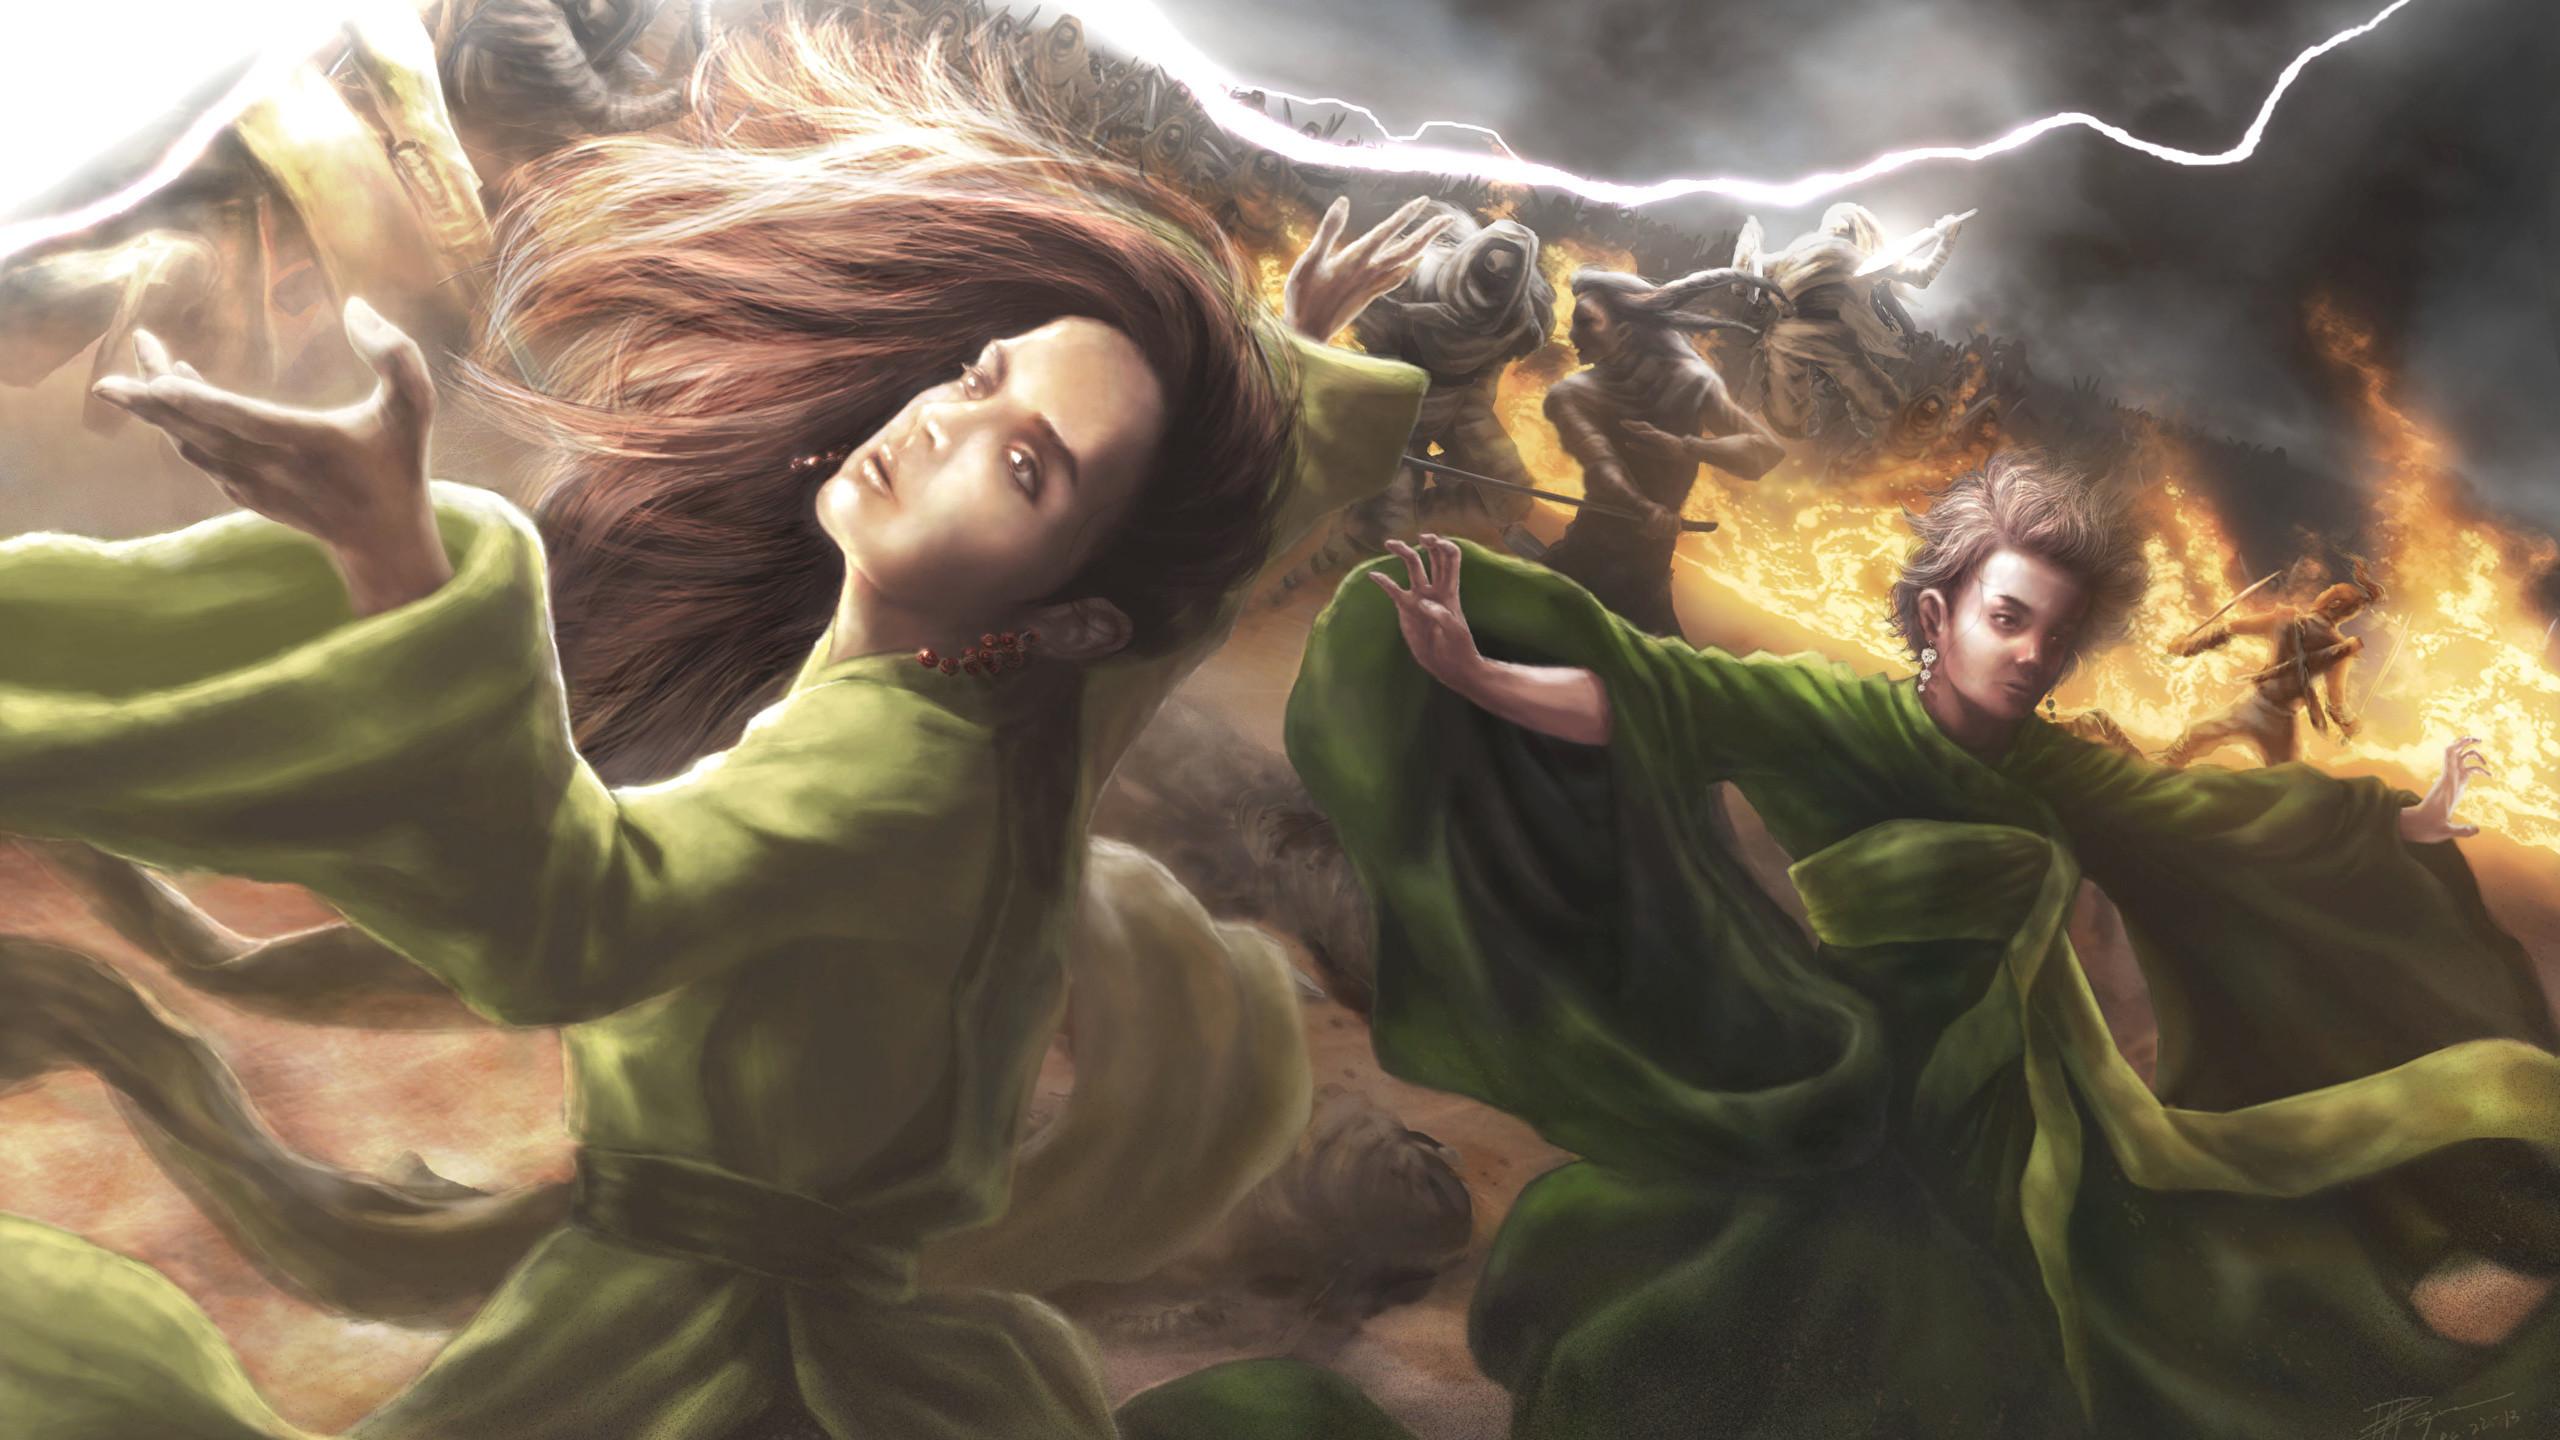 Wallpaper Illustrations to books The Wheel of Time Girls Fantasy 2560×1440